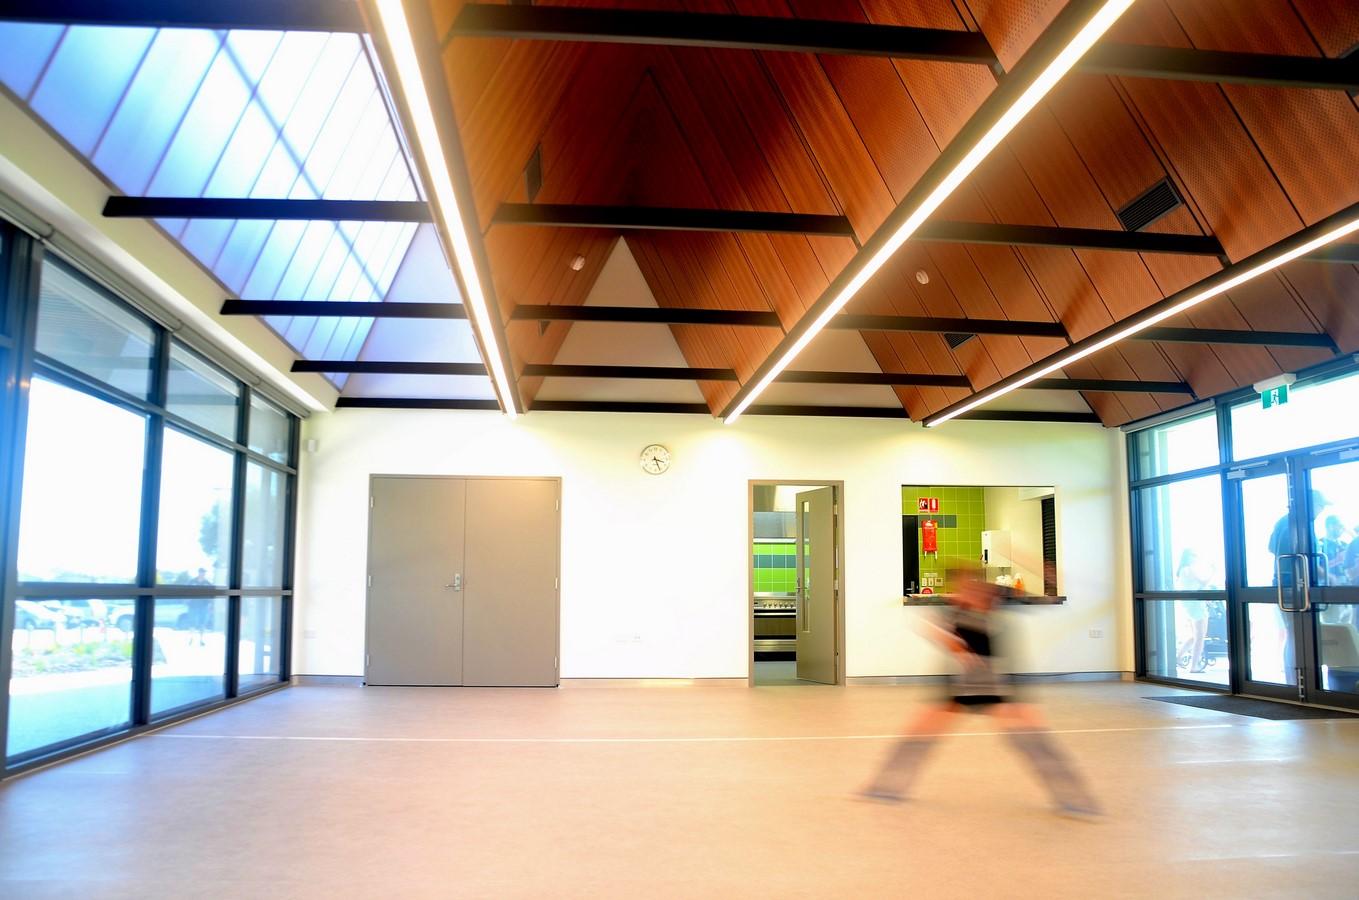 Grandis Park Sports Pavilion, Banksia Grove905 - Sheet3